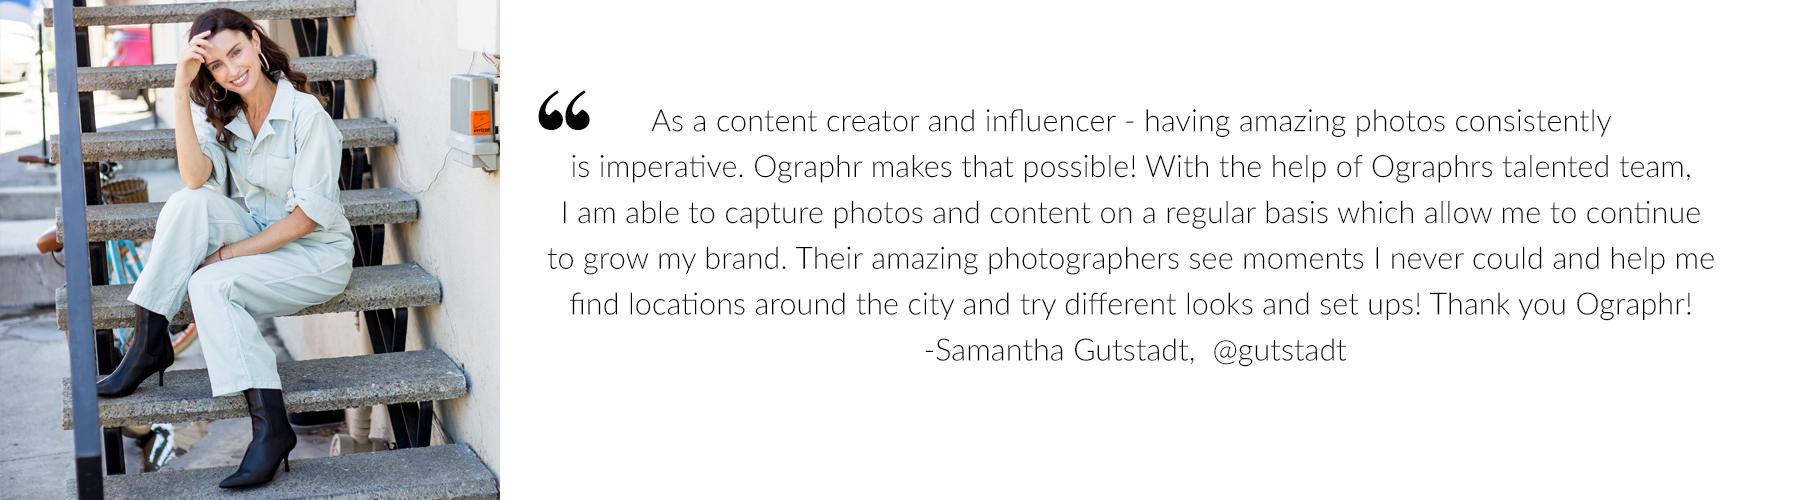 ographr app - local photographers on demand